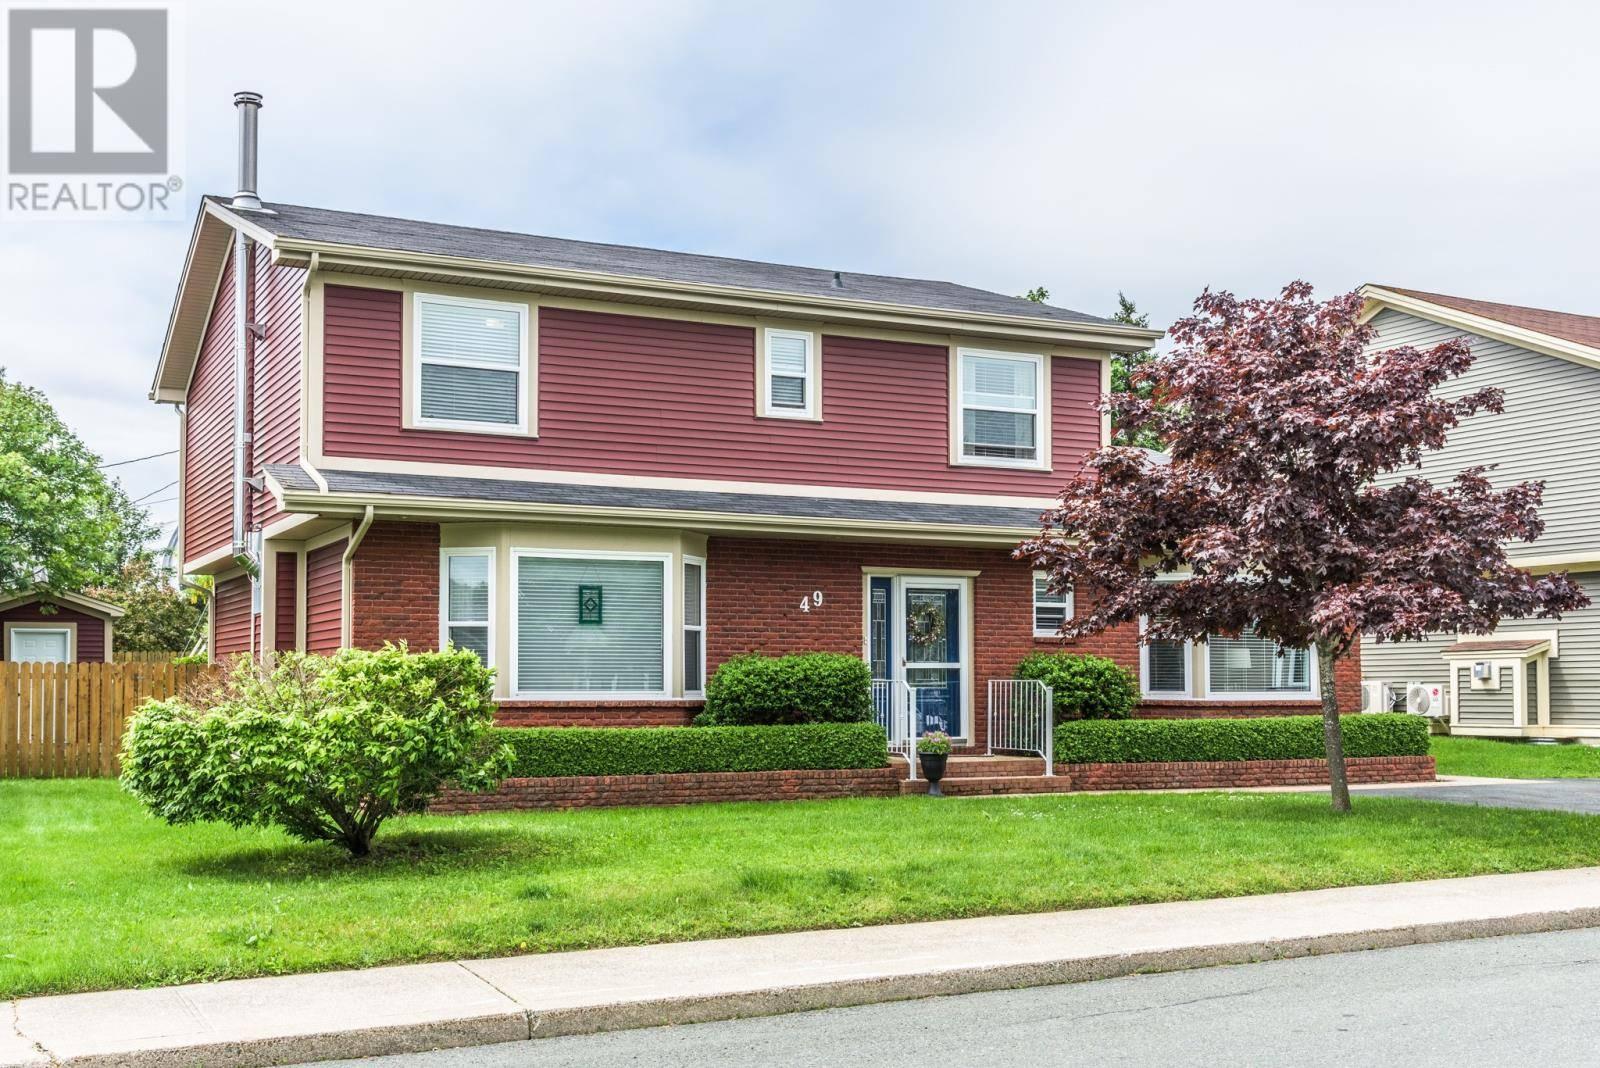 House for sale at 49 Mountbatten Dr St. John's Newfoundland - MLS: 1207332